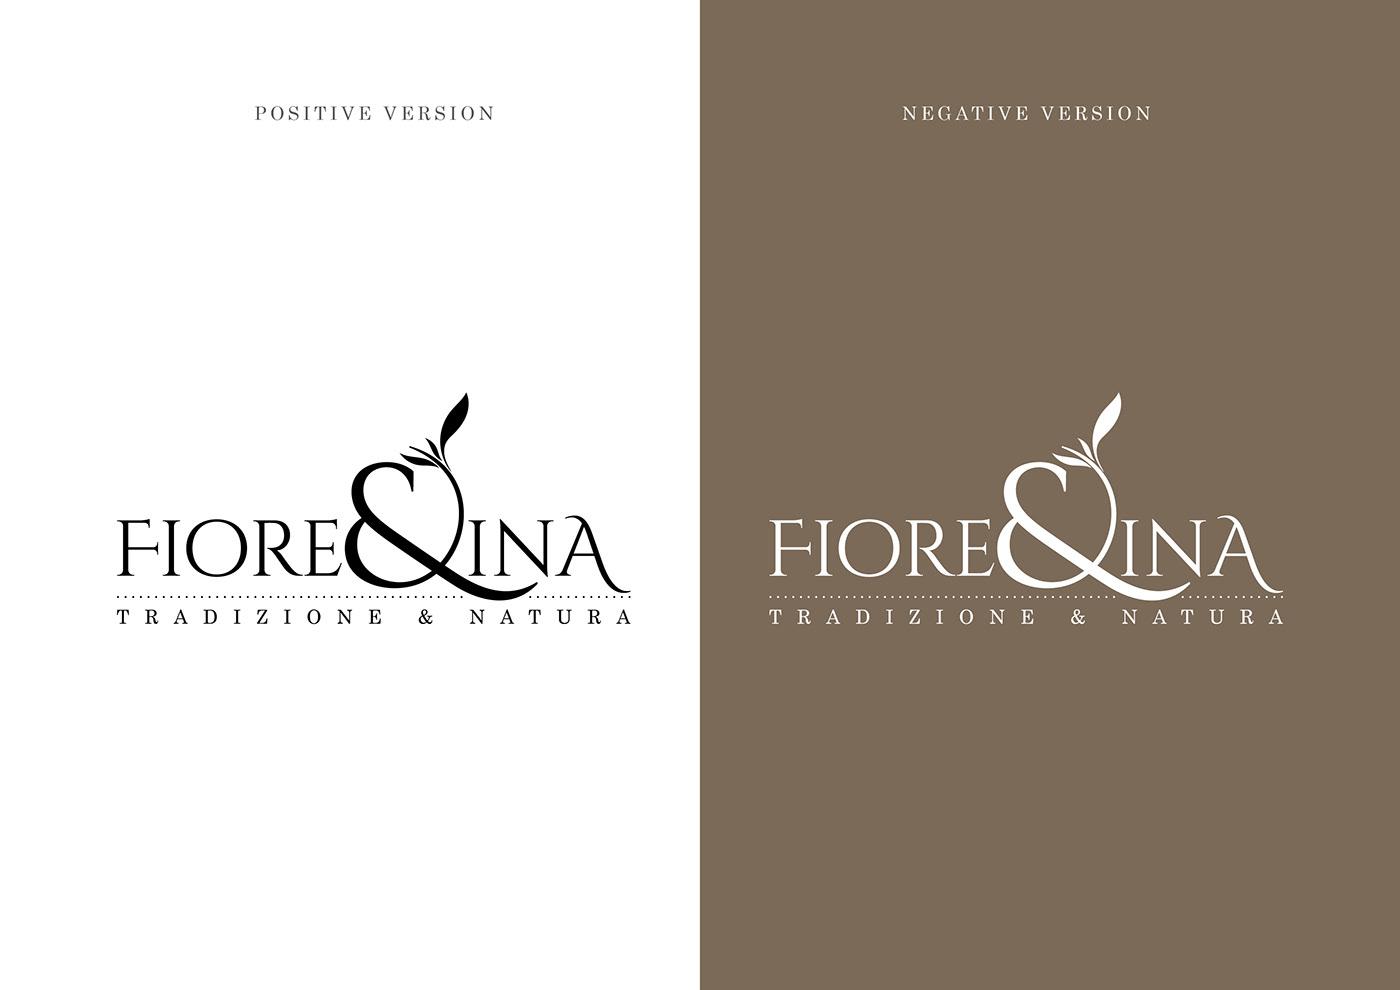 Advertising  brand identity Creative Direction  ILLUSTRATION  Logotipo